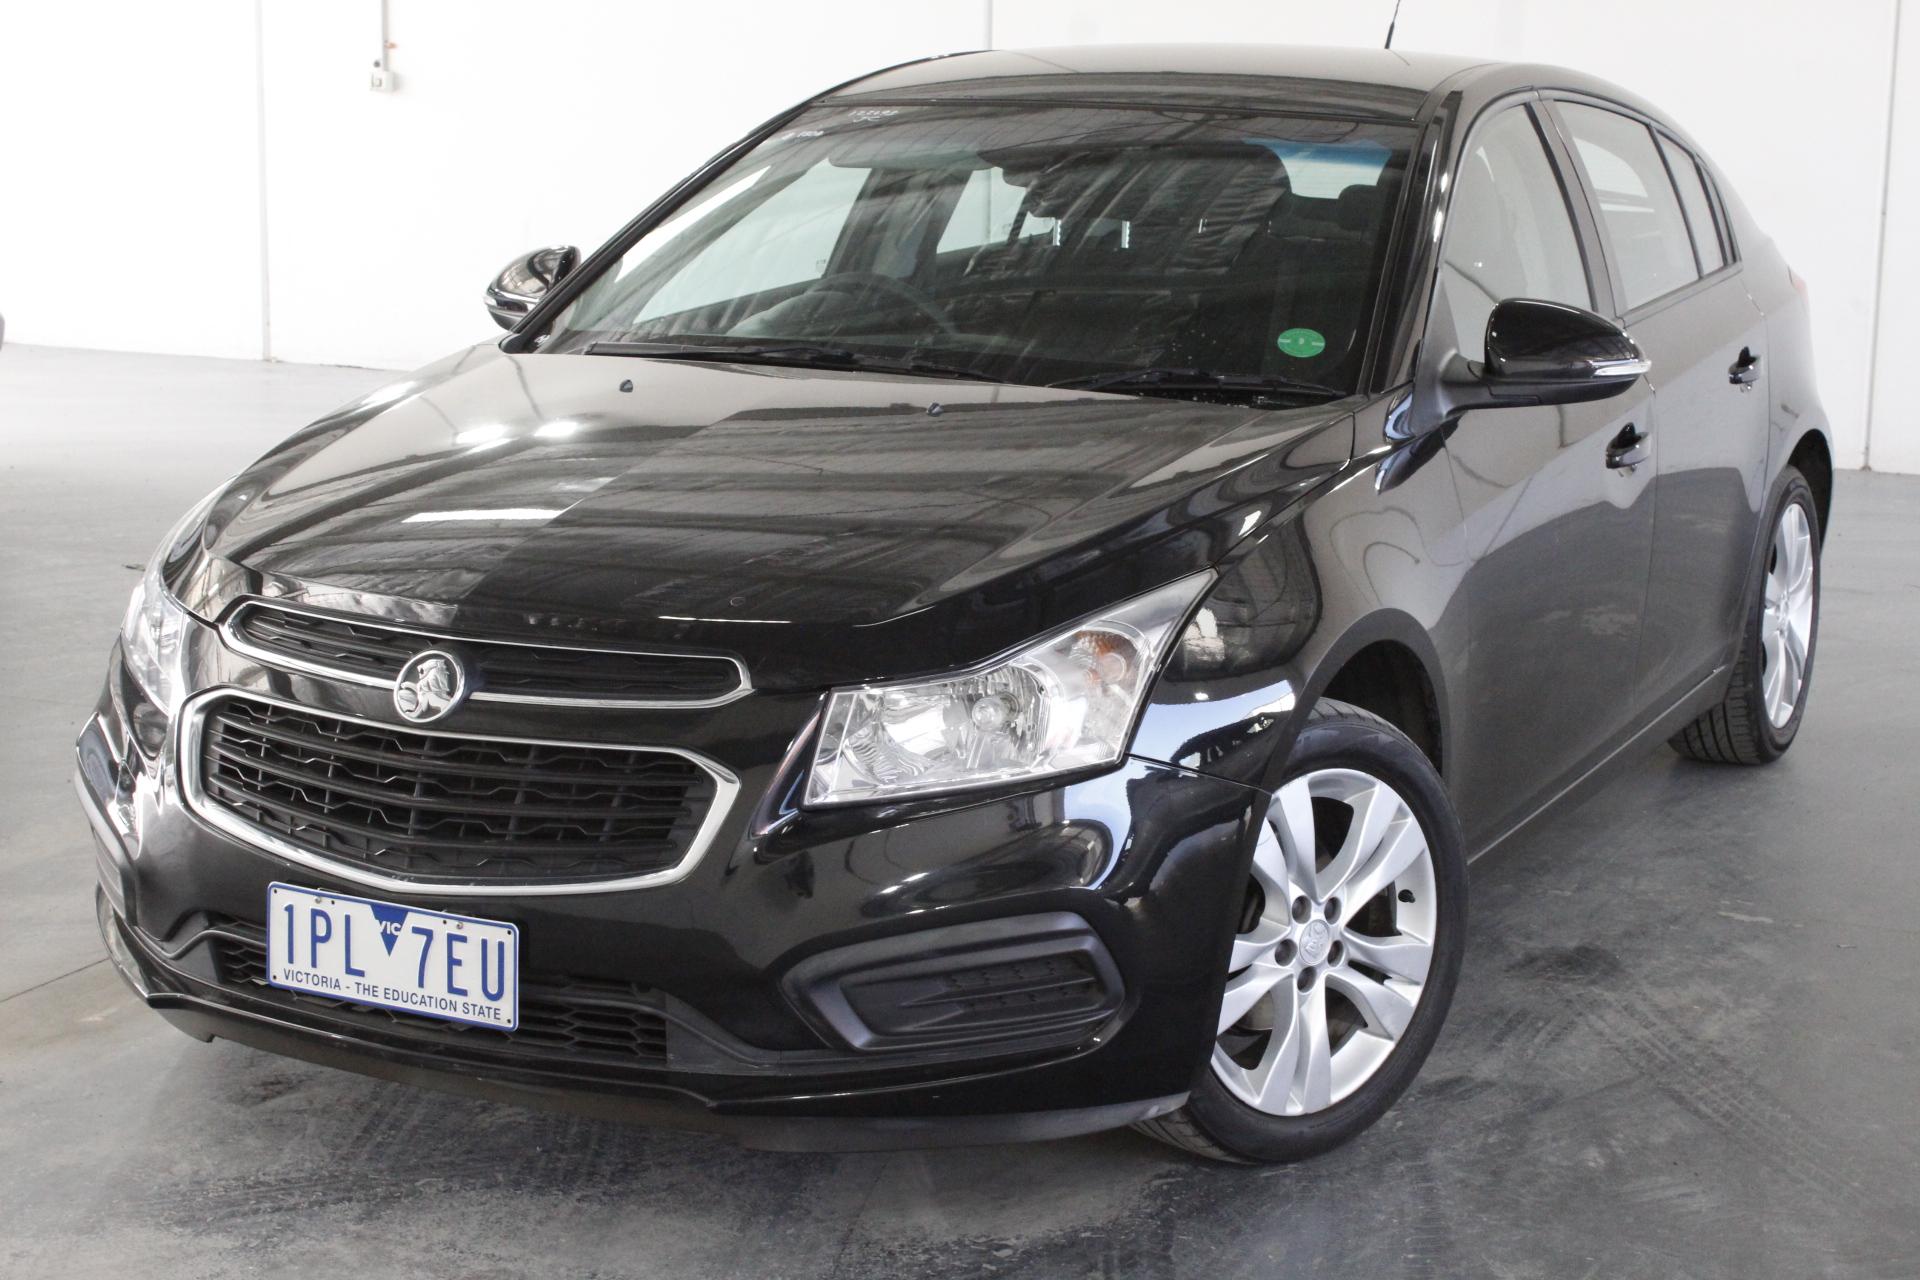 2015 Holden Cruze CD JH Automatic Hatchback